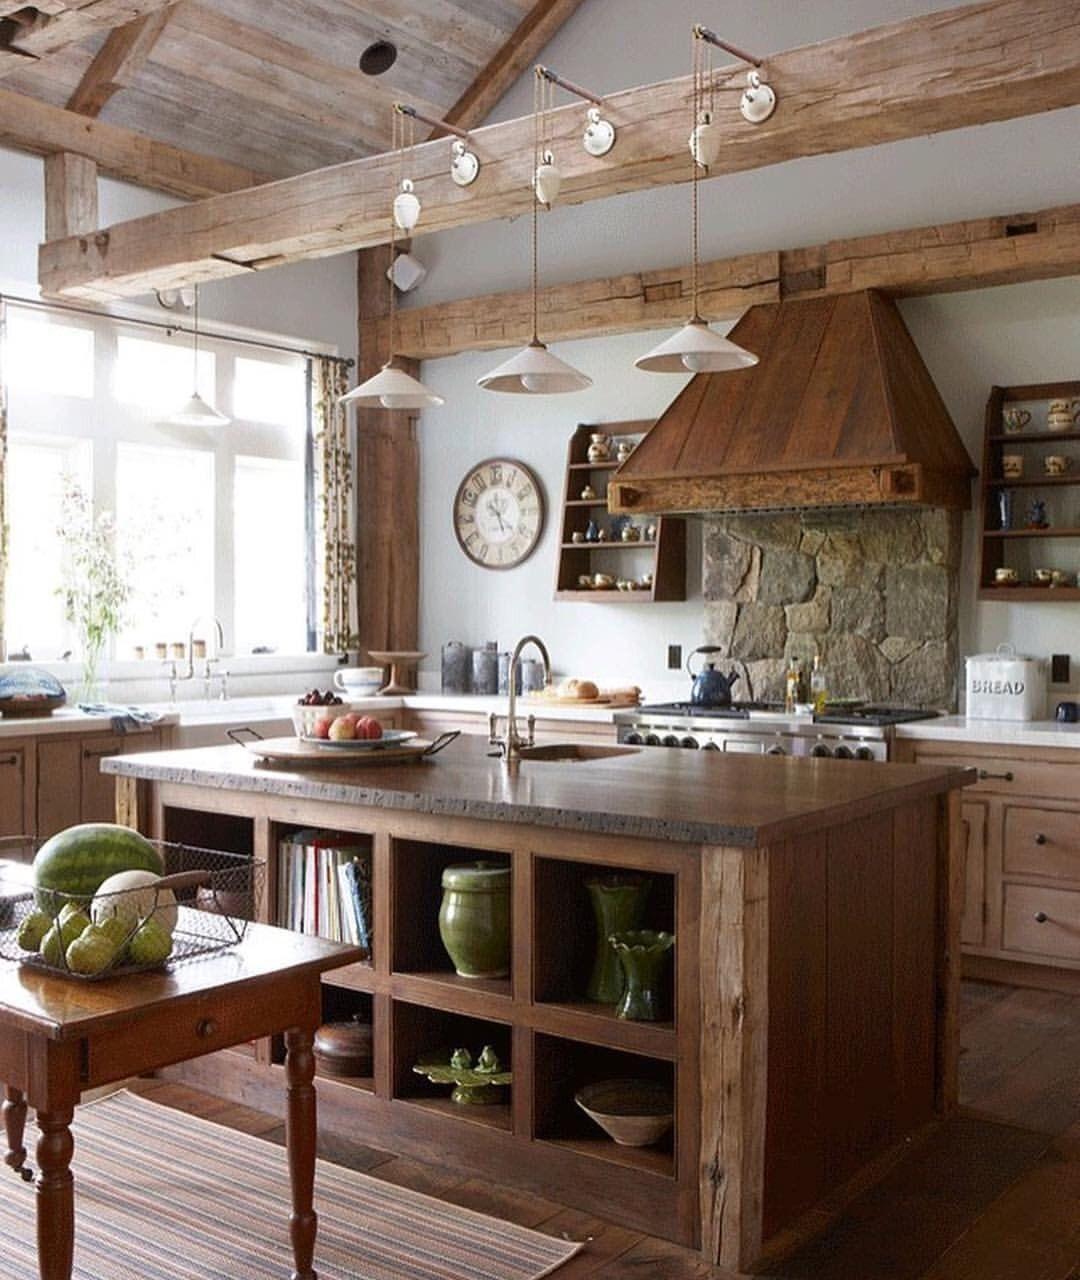 TheRedheadFromVa : Photo | baños y cocinas | Pinterest | Barras para ...